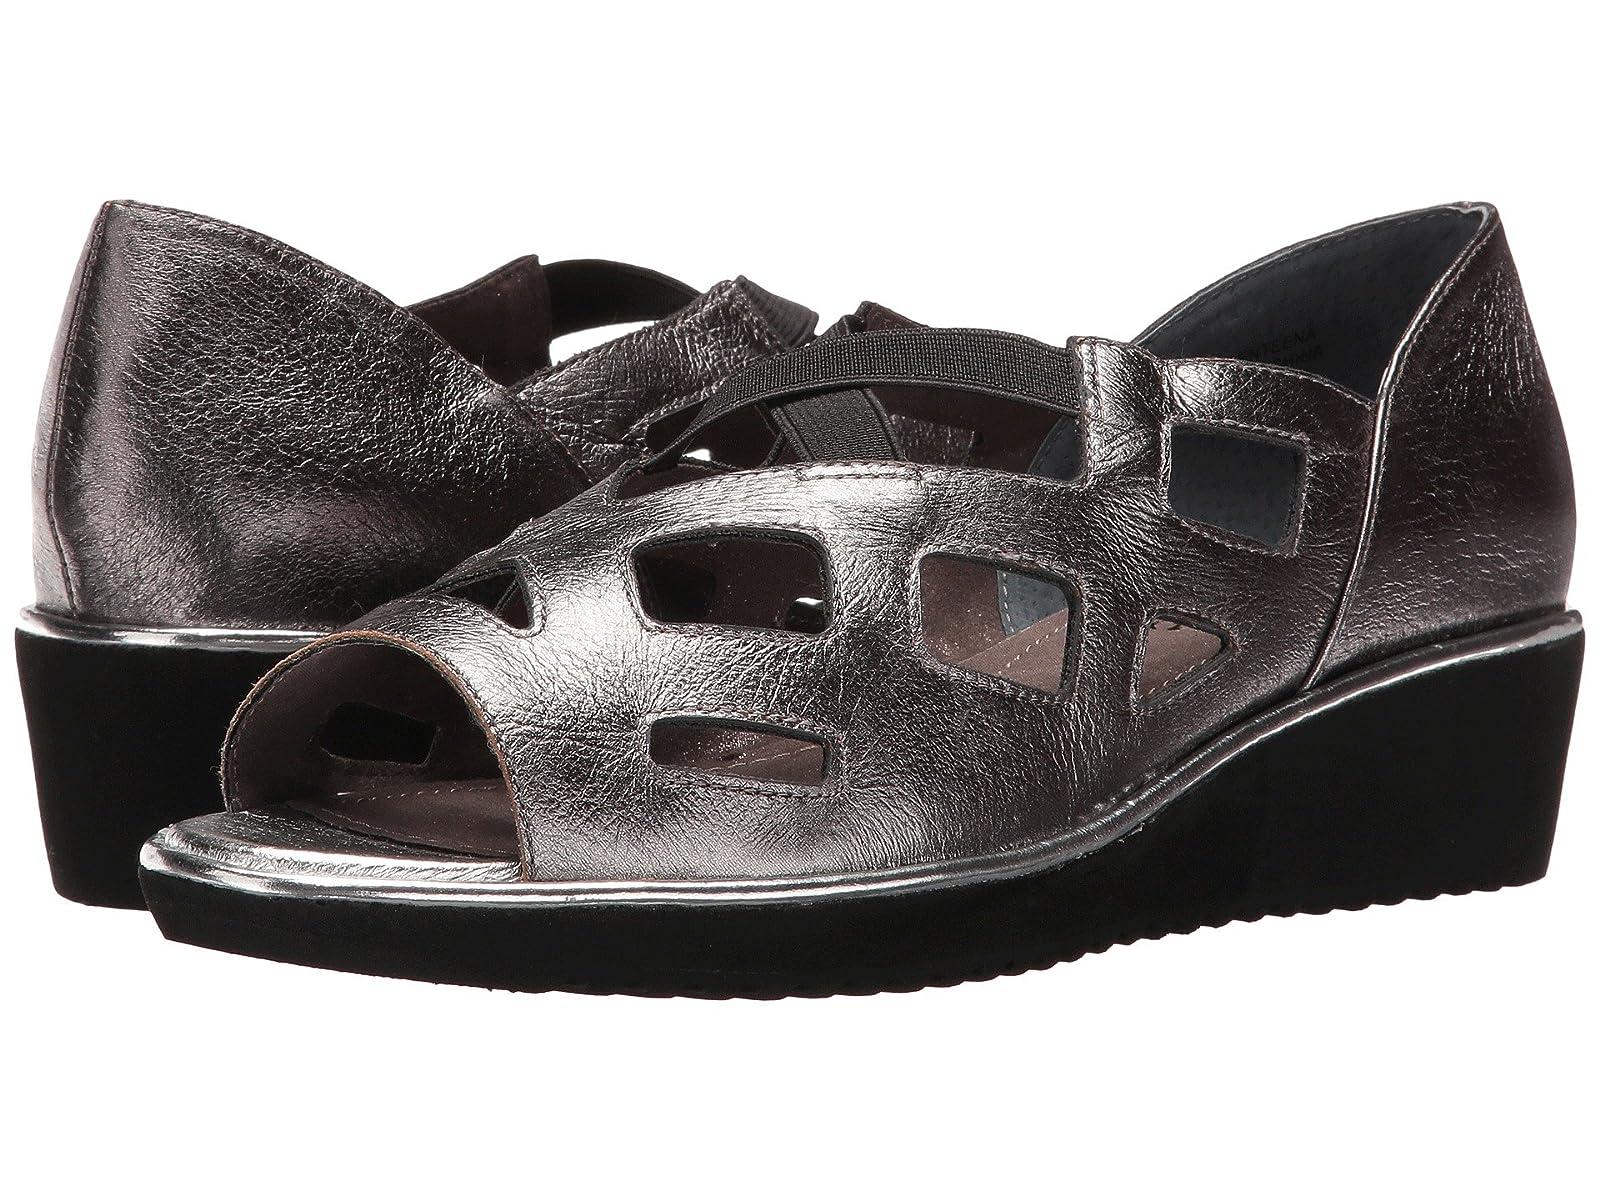 J. Renee ValenteenaCheap and distinctive eye-catching shoes